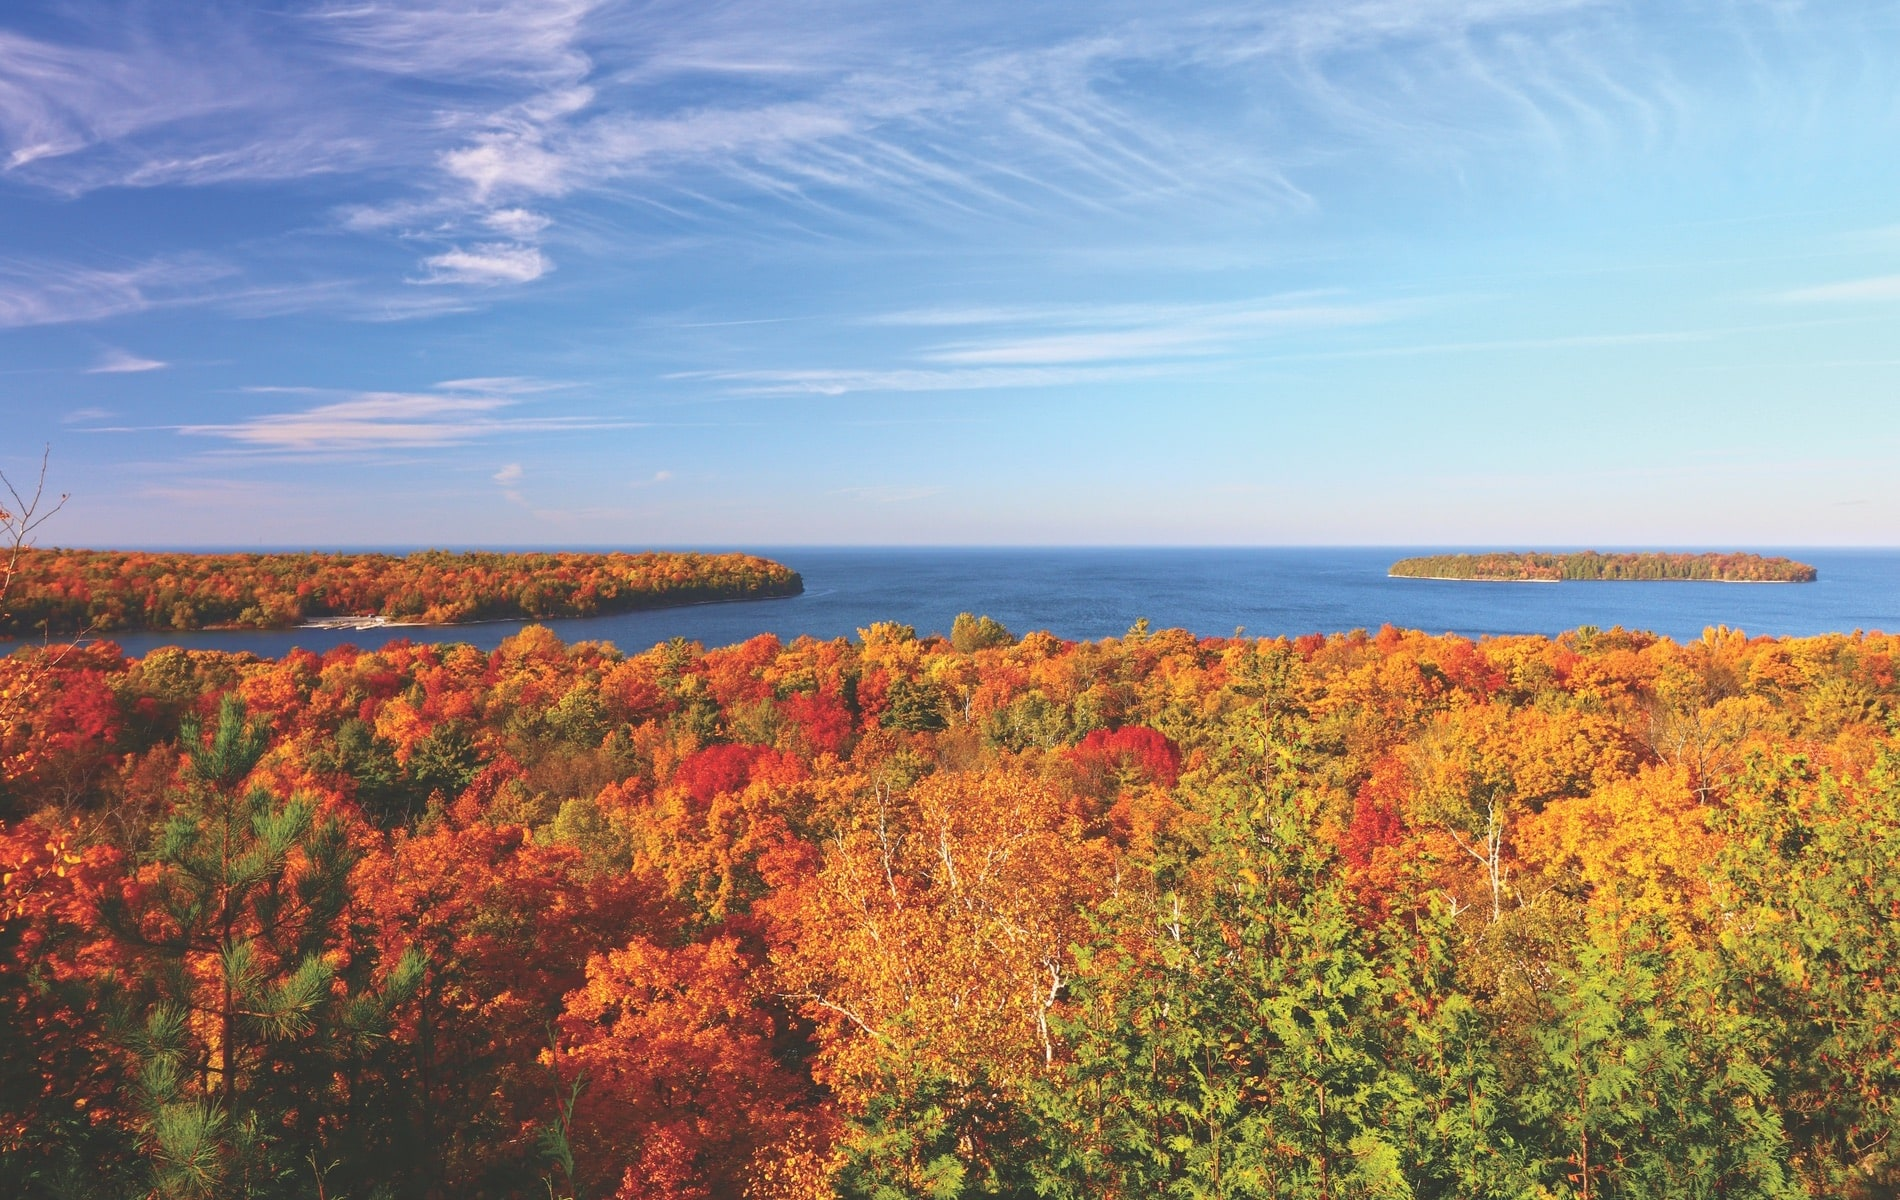 Destination Door County, Door Peninsula, Fall Foliage Destinations